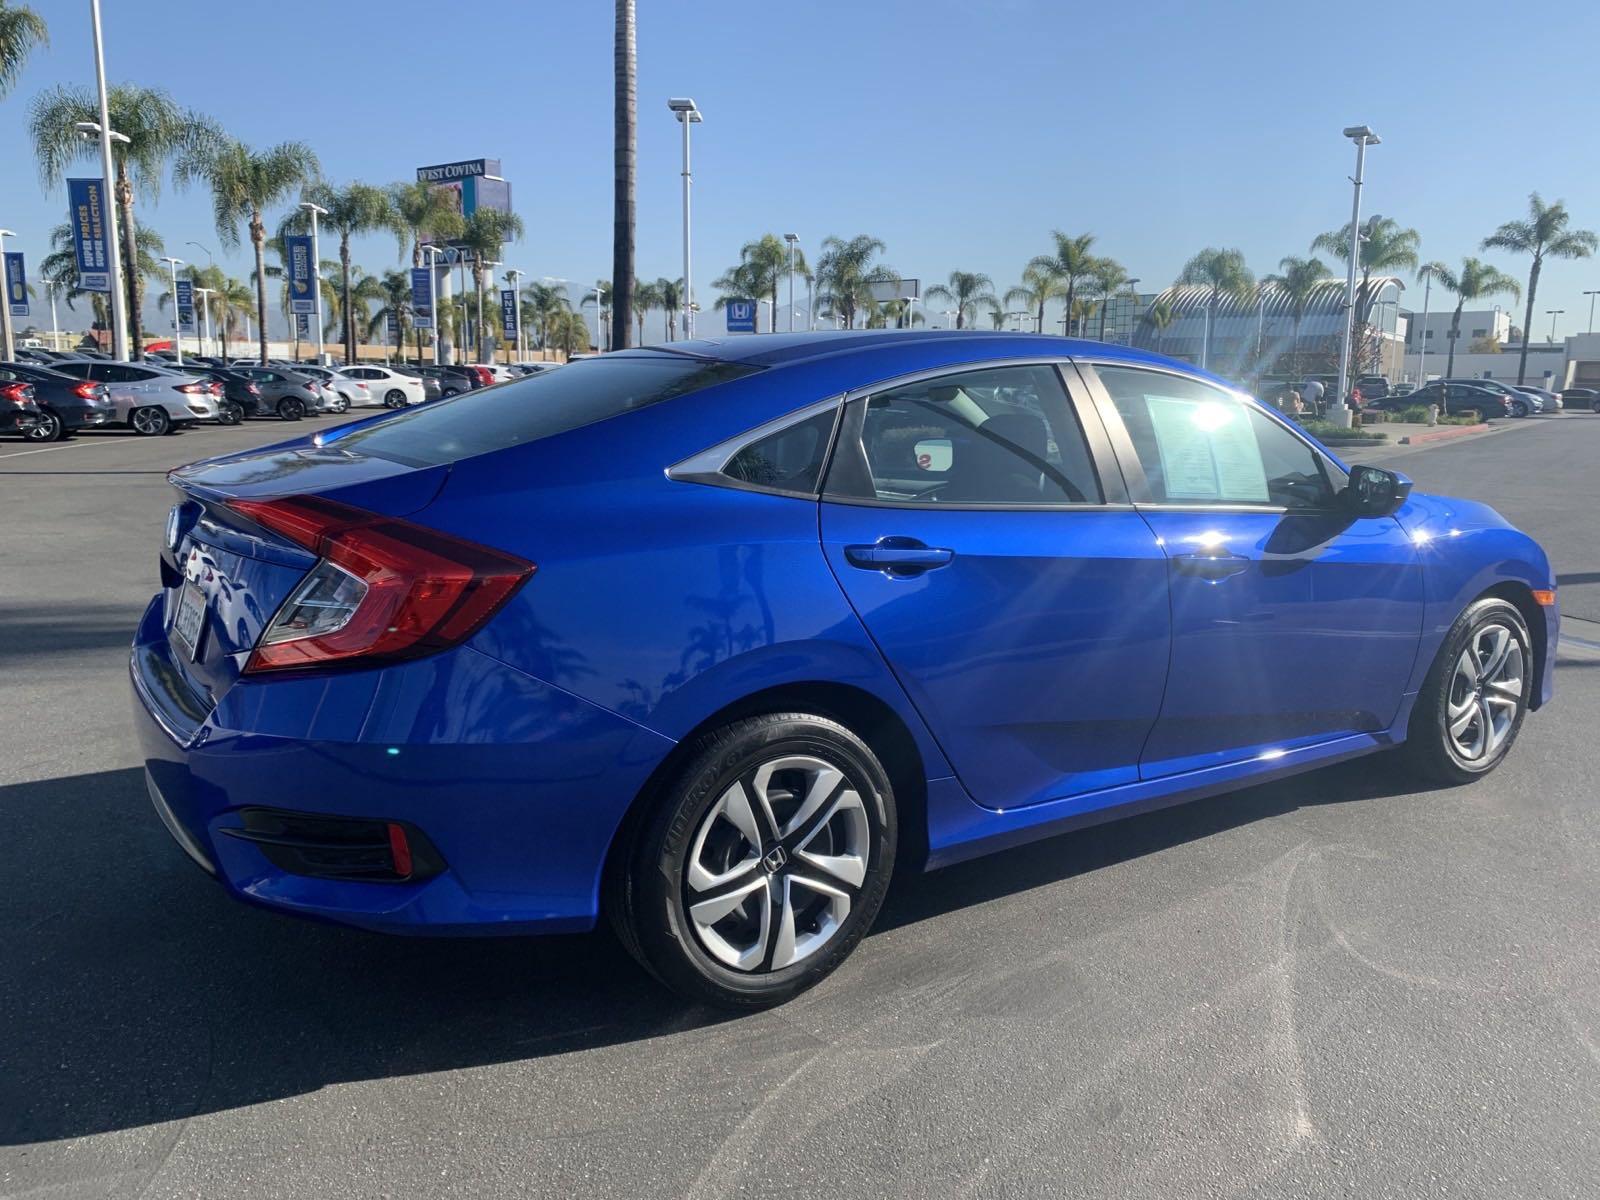 Certified Pre-Owned 2018 Honda Civic Sedan LX